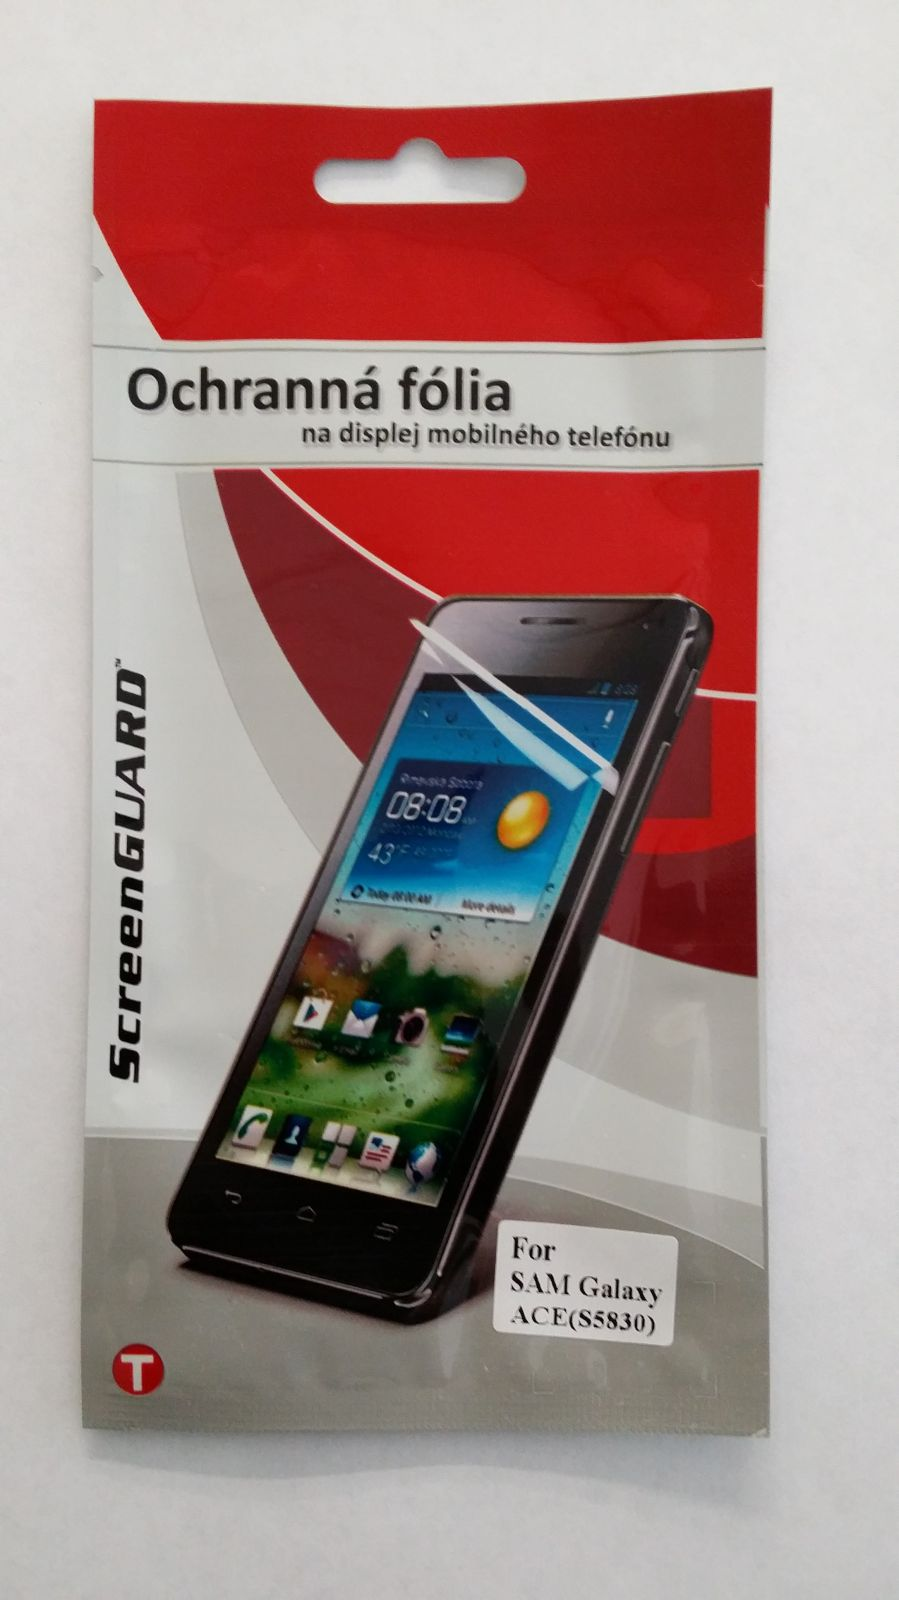 Mobilnet ochranná folie pro Samsung Galaxy Ace/S5830